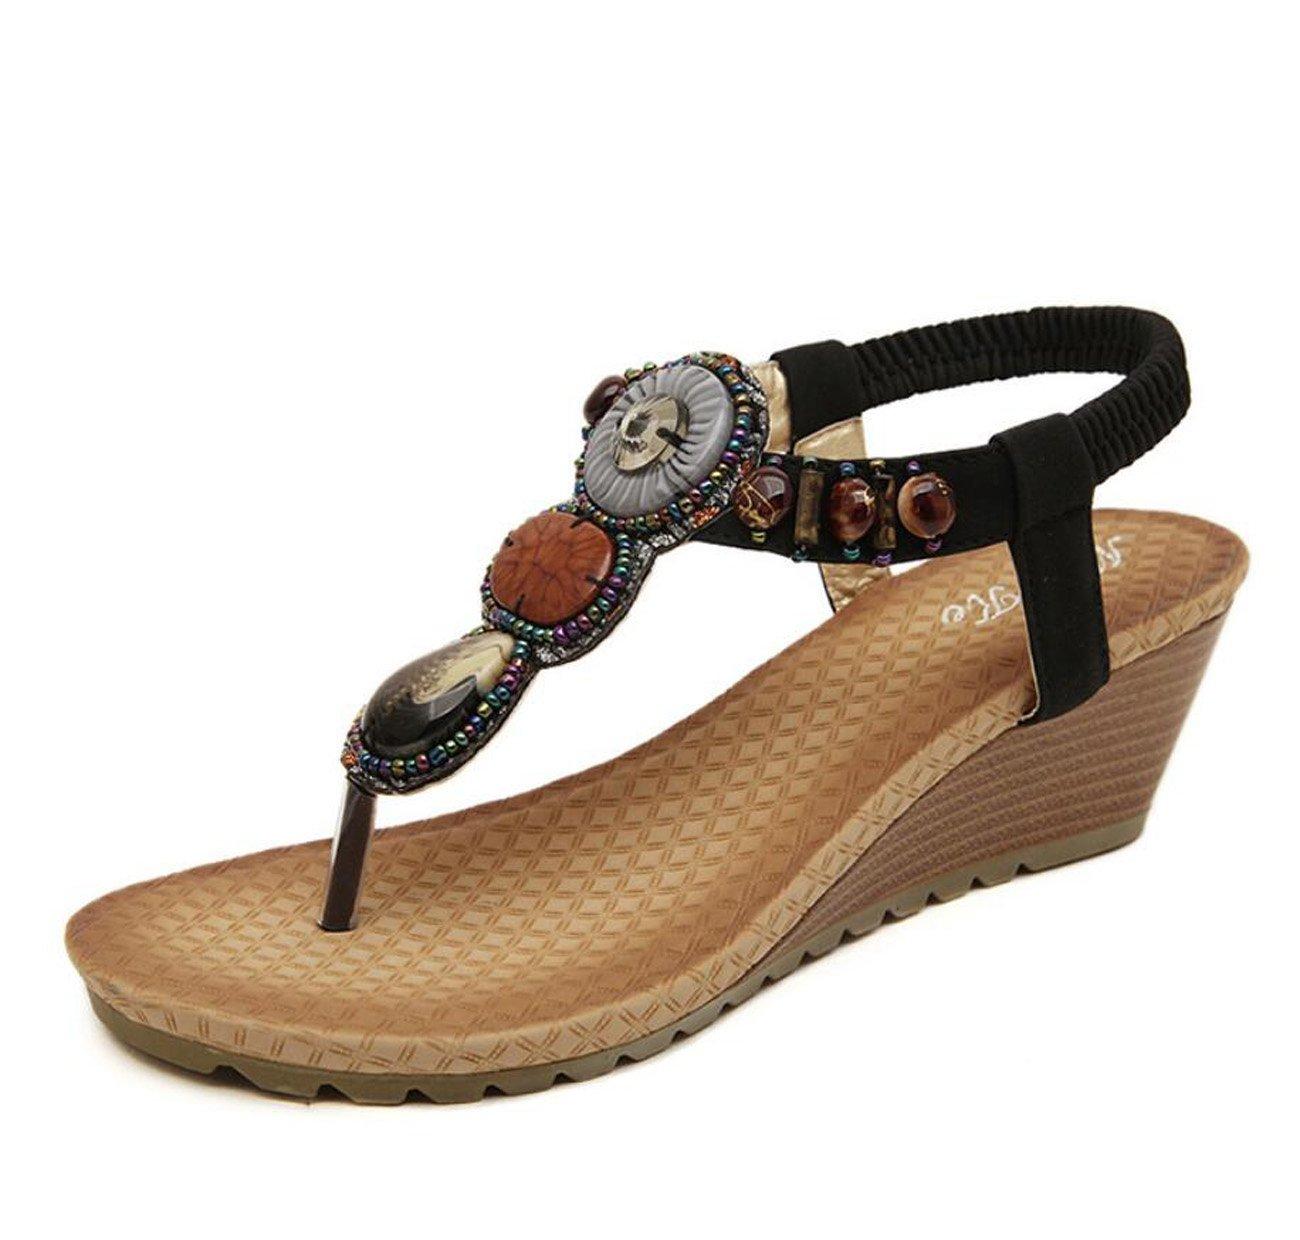 Damen Damen Sommer Sandalen Flip Flops Strass Plattform Keile Heels Schuhe Flip Flops fuuml;r Mauml;dchen ( Color : Black , Grouml;szlig;e : 42 )  42|Black